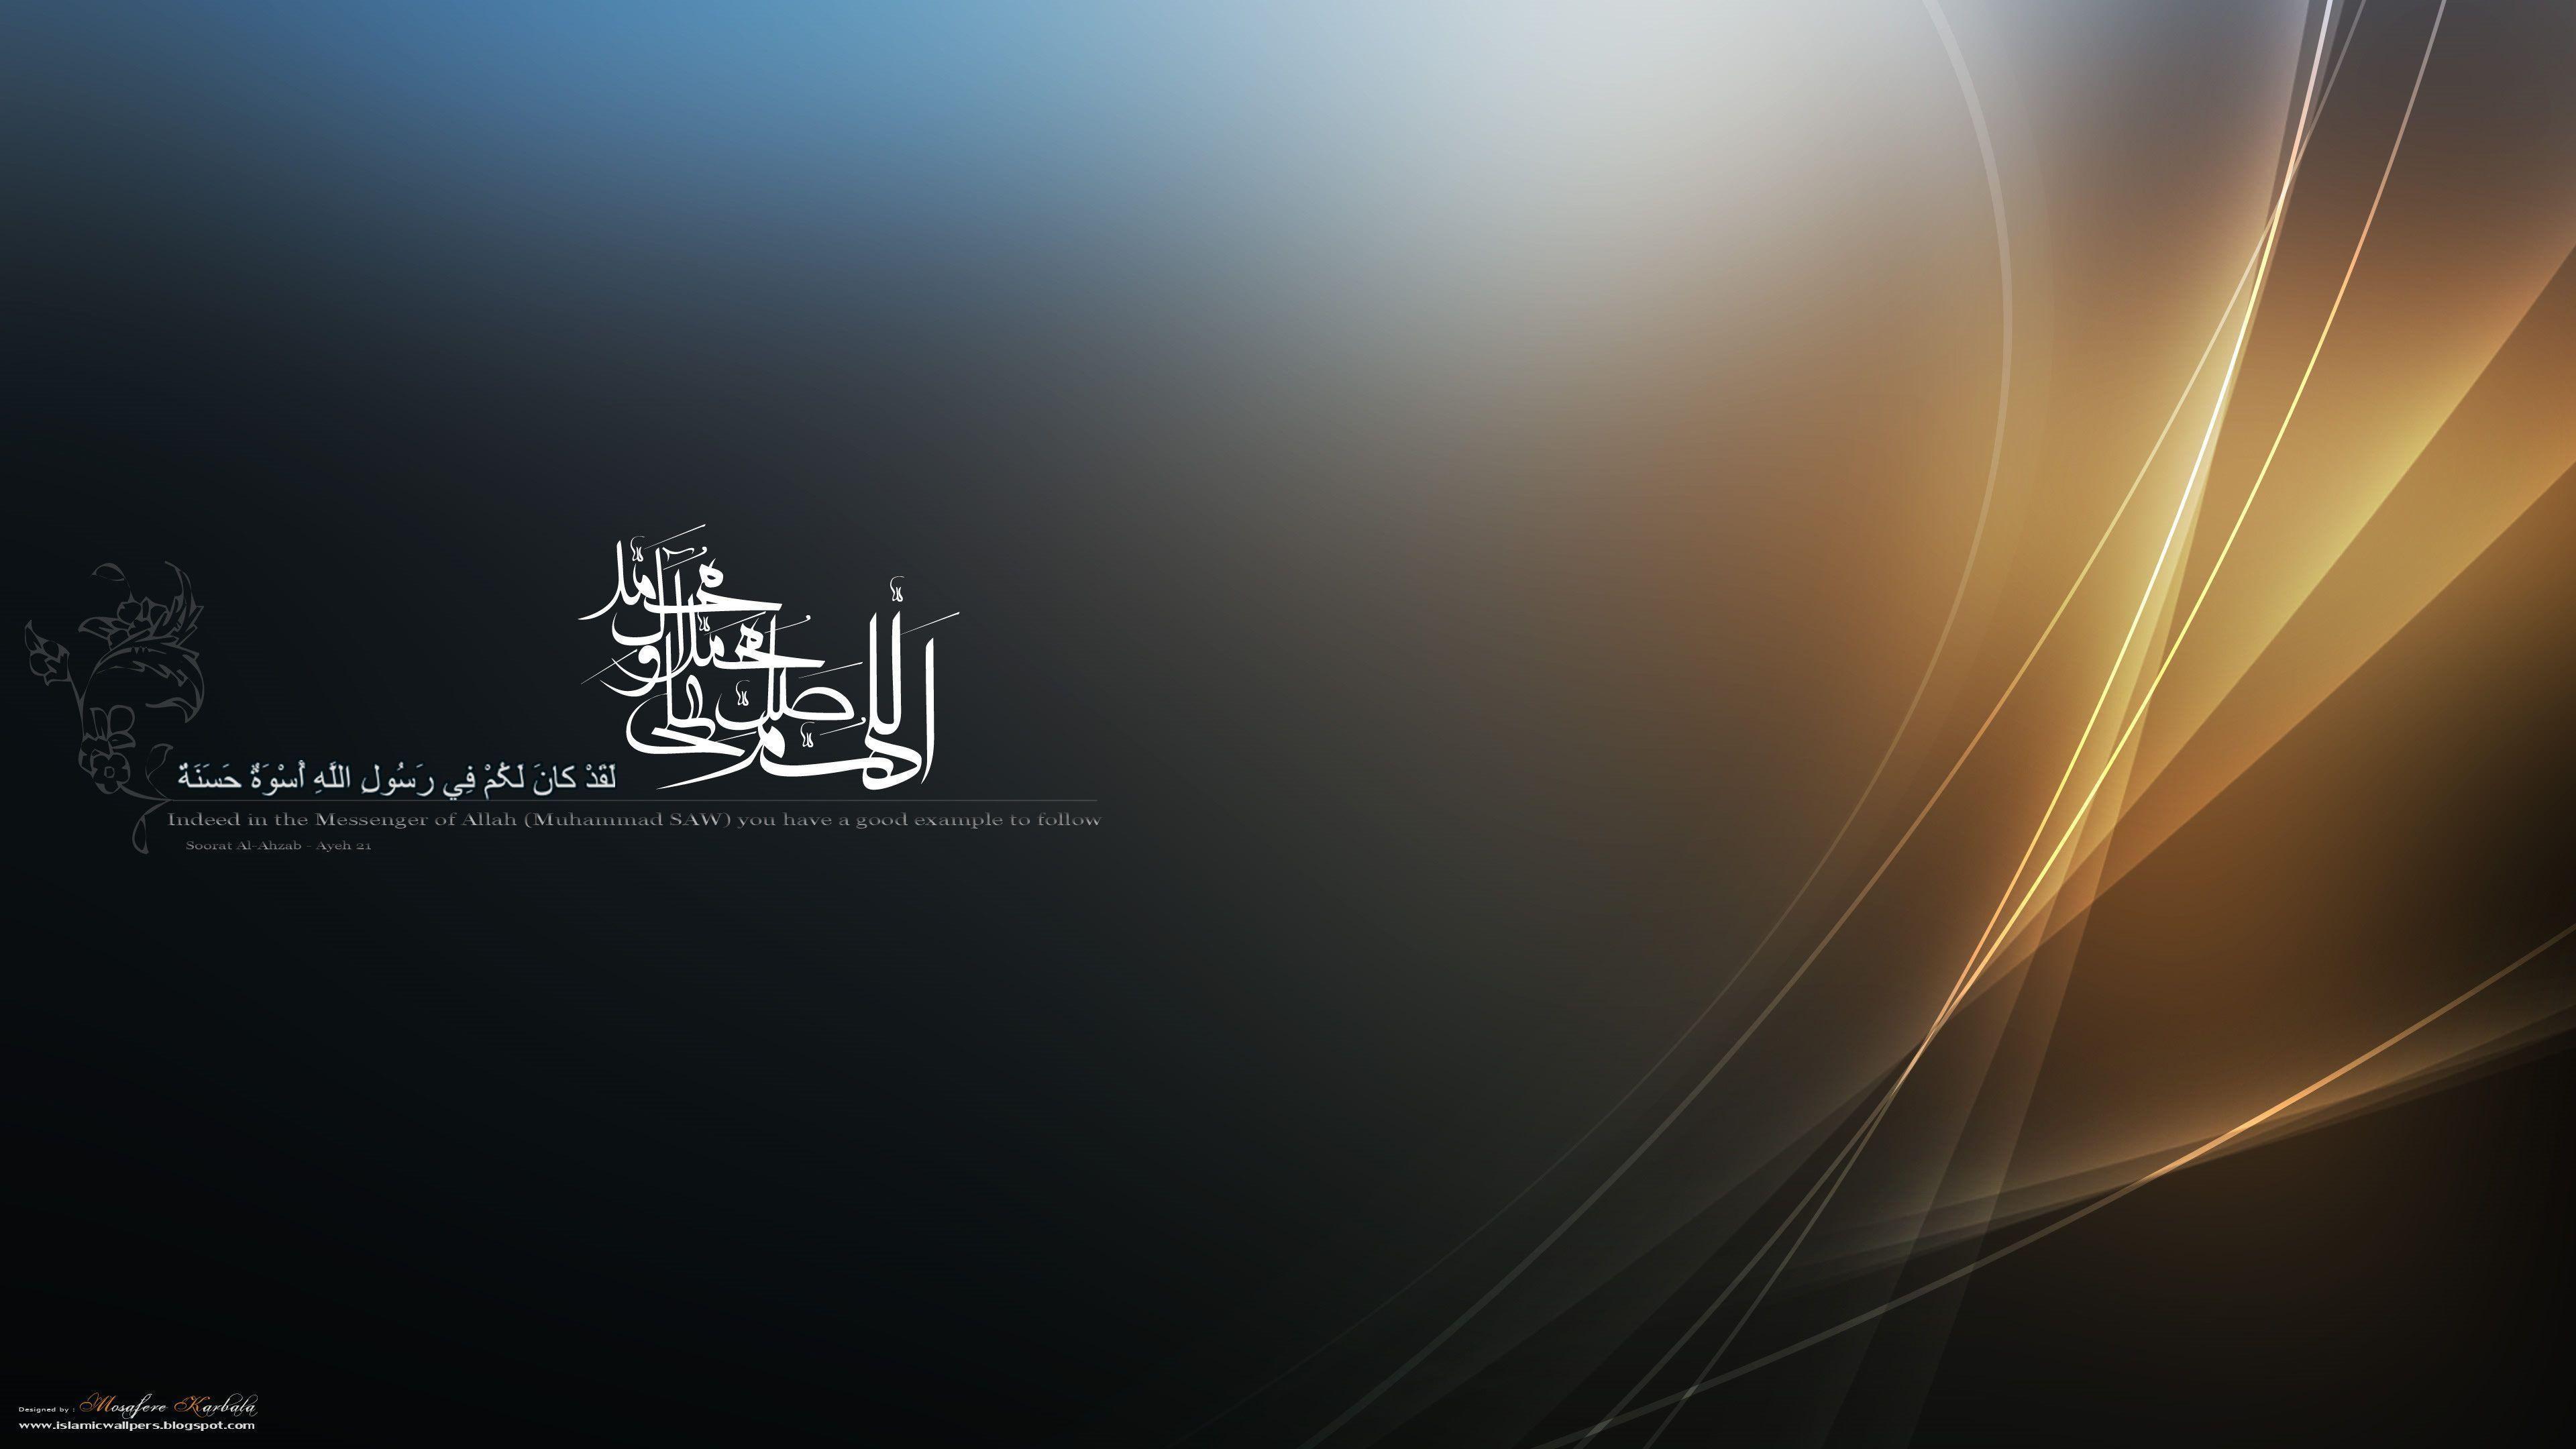 Unduh 100 Wallpaper Android Islam Hd HD Gratis